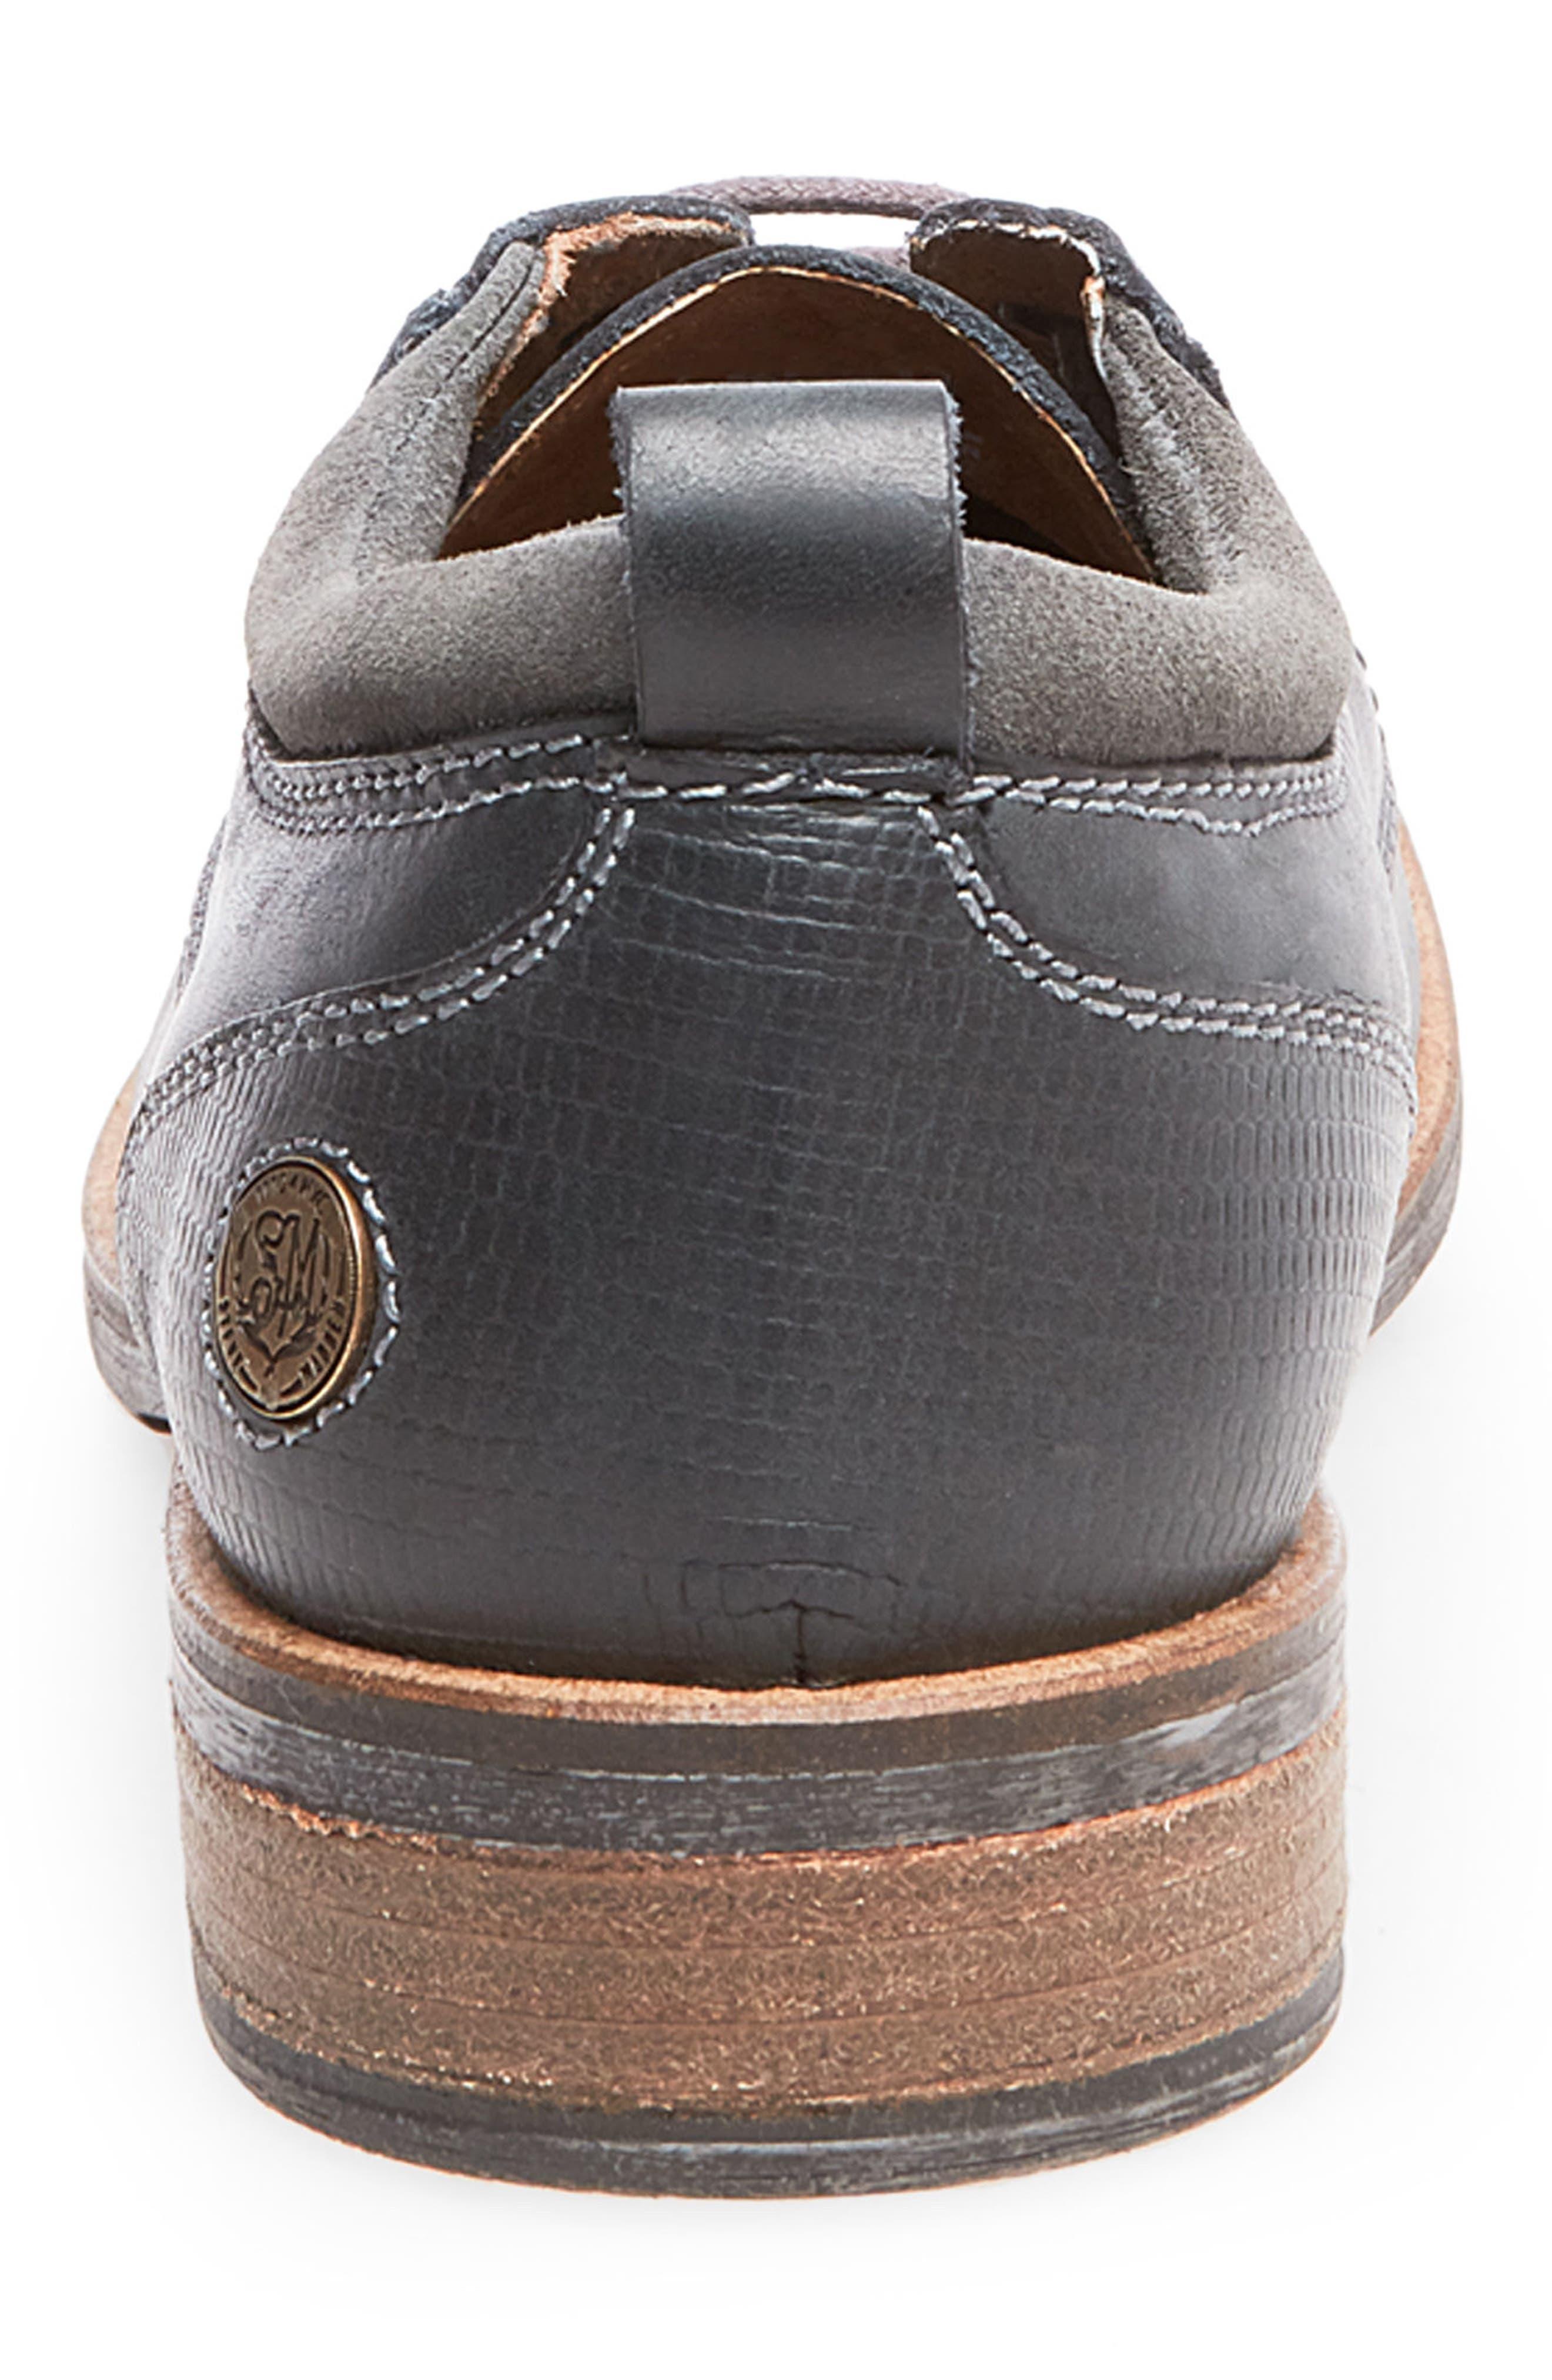 Narrate Plain Toe Derby,                             Alternate thumbnail 7, color,                             001